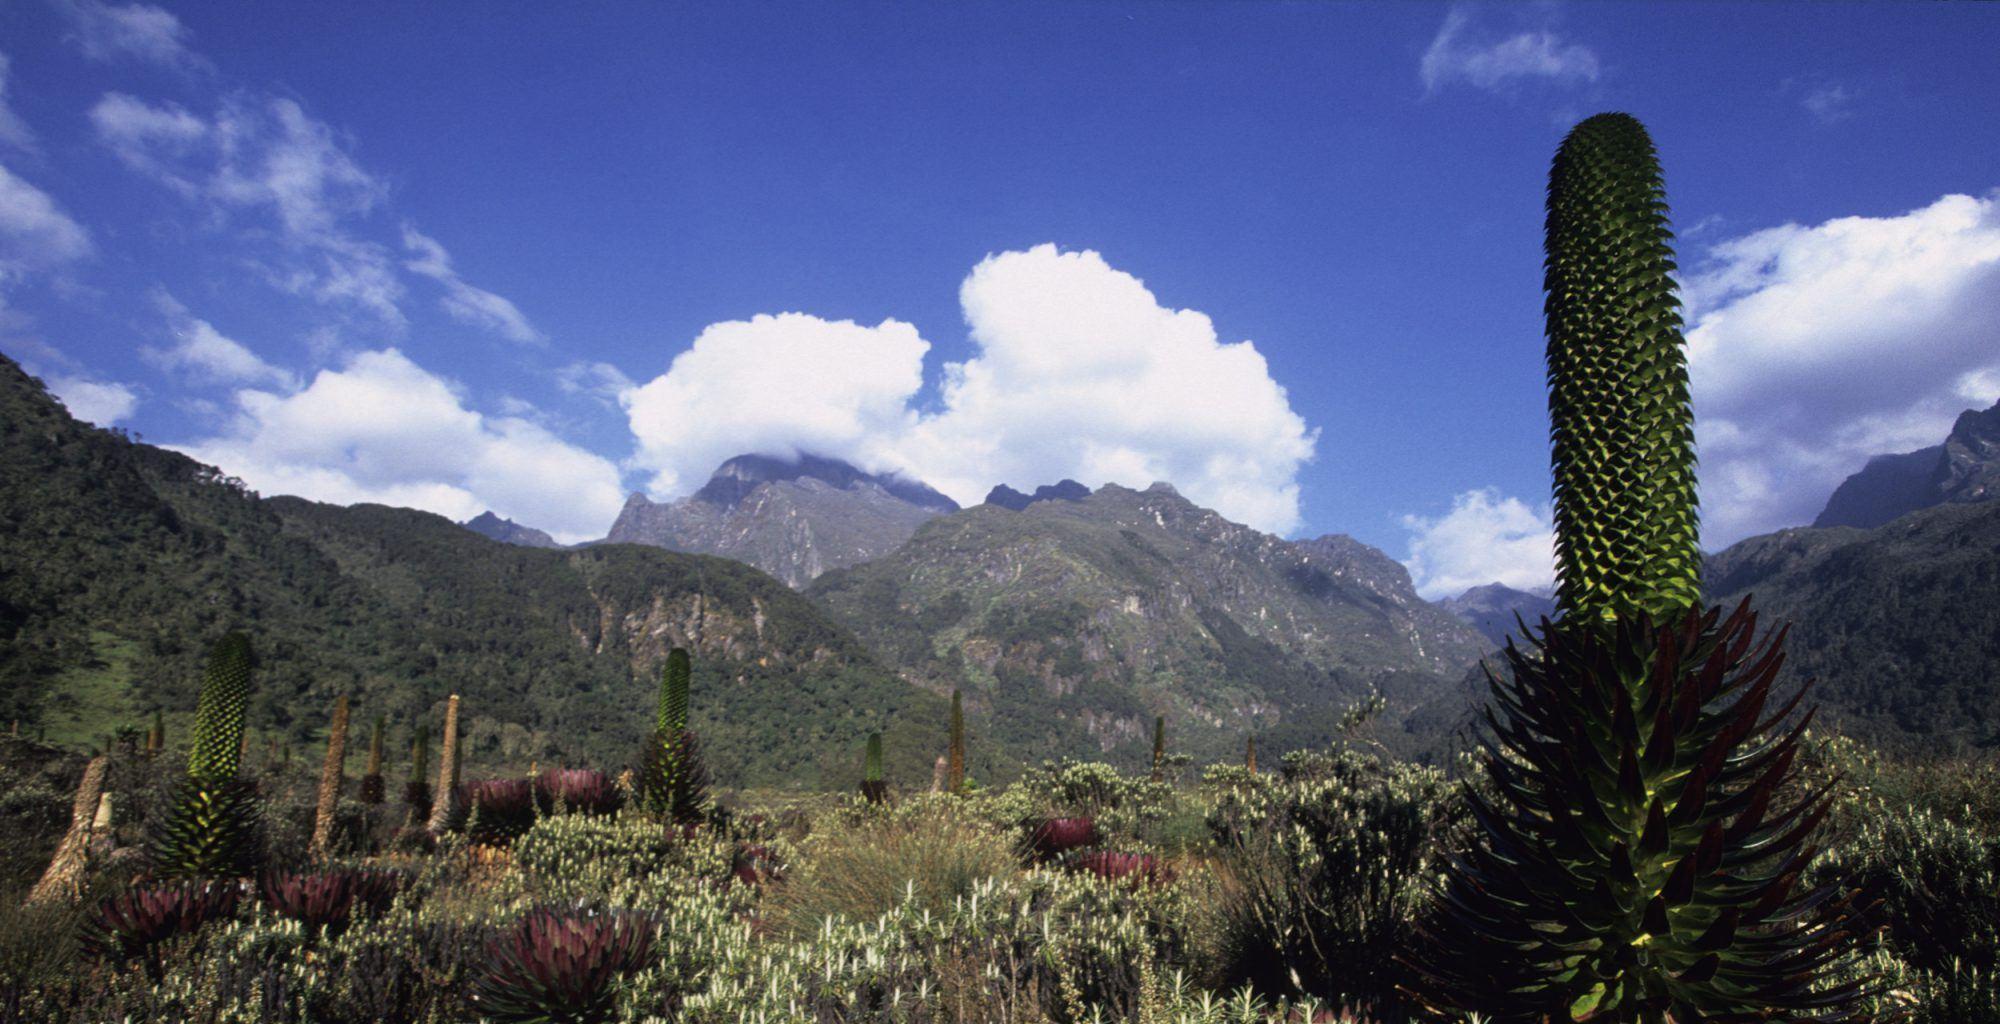 Uganda-Rwenzori-Mountains-Landscape